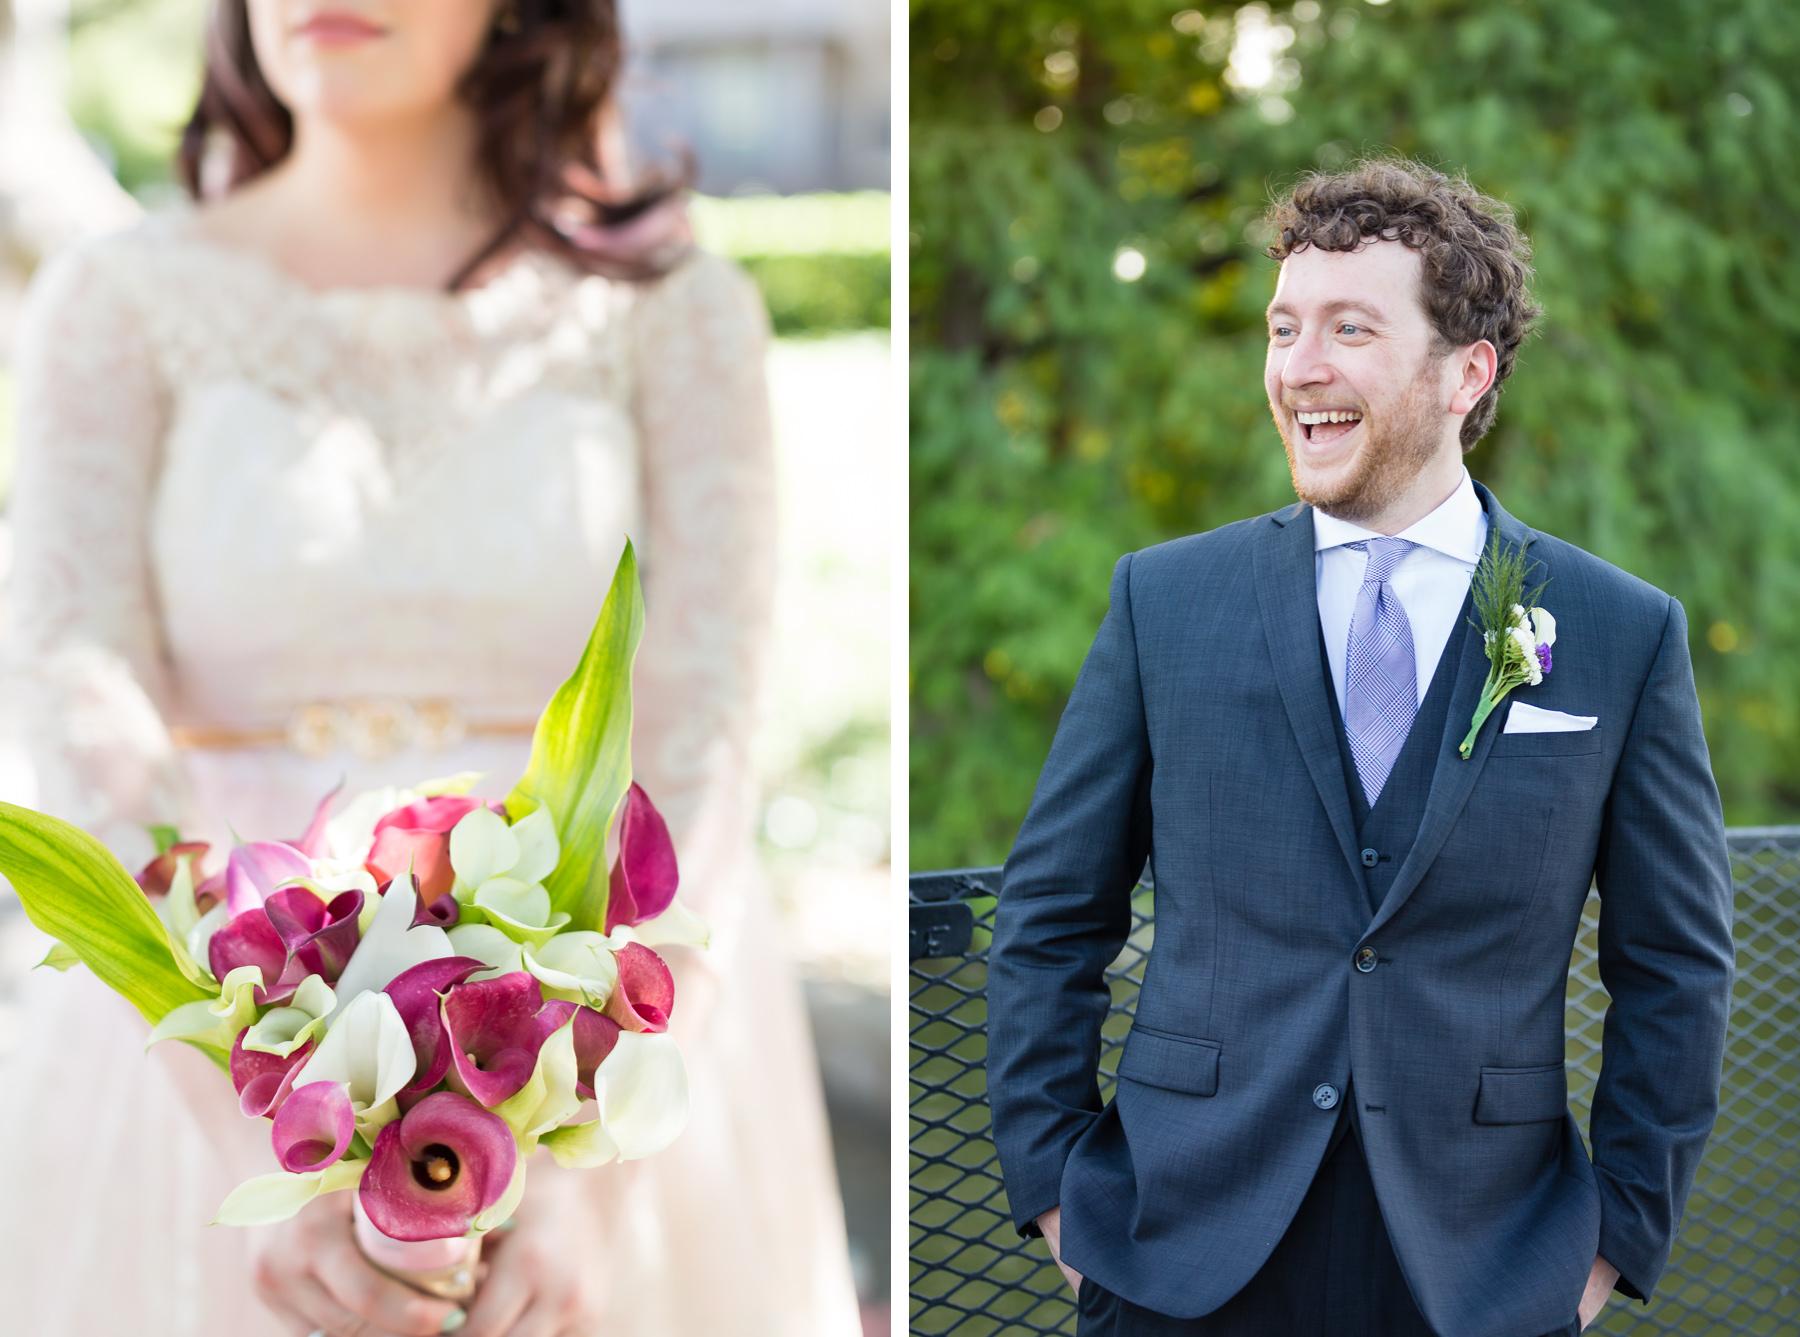 prickly-pair-farms-flowers-wedding.jpg